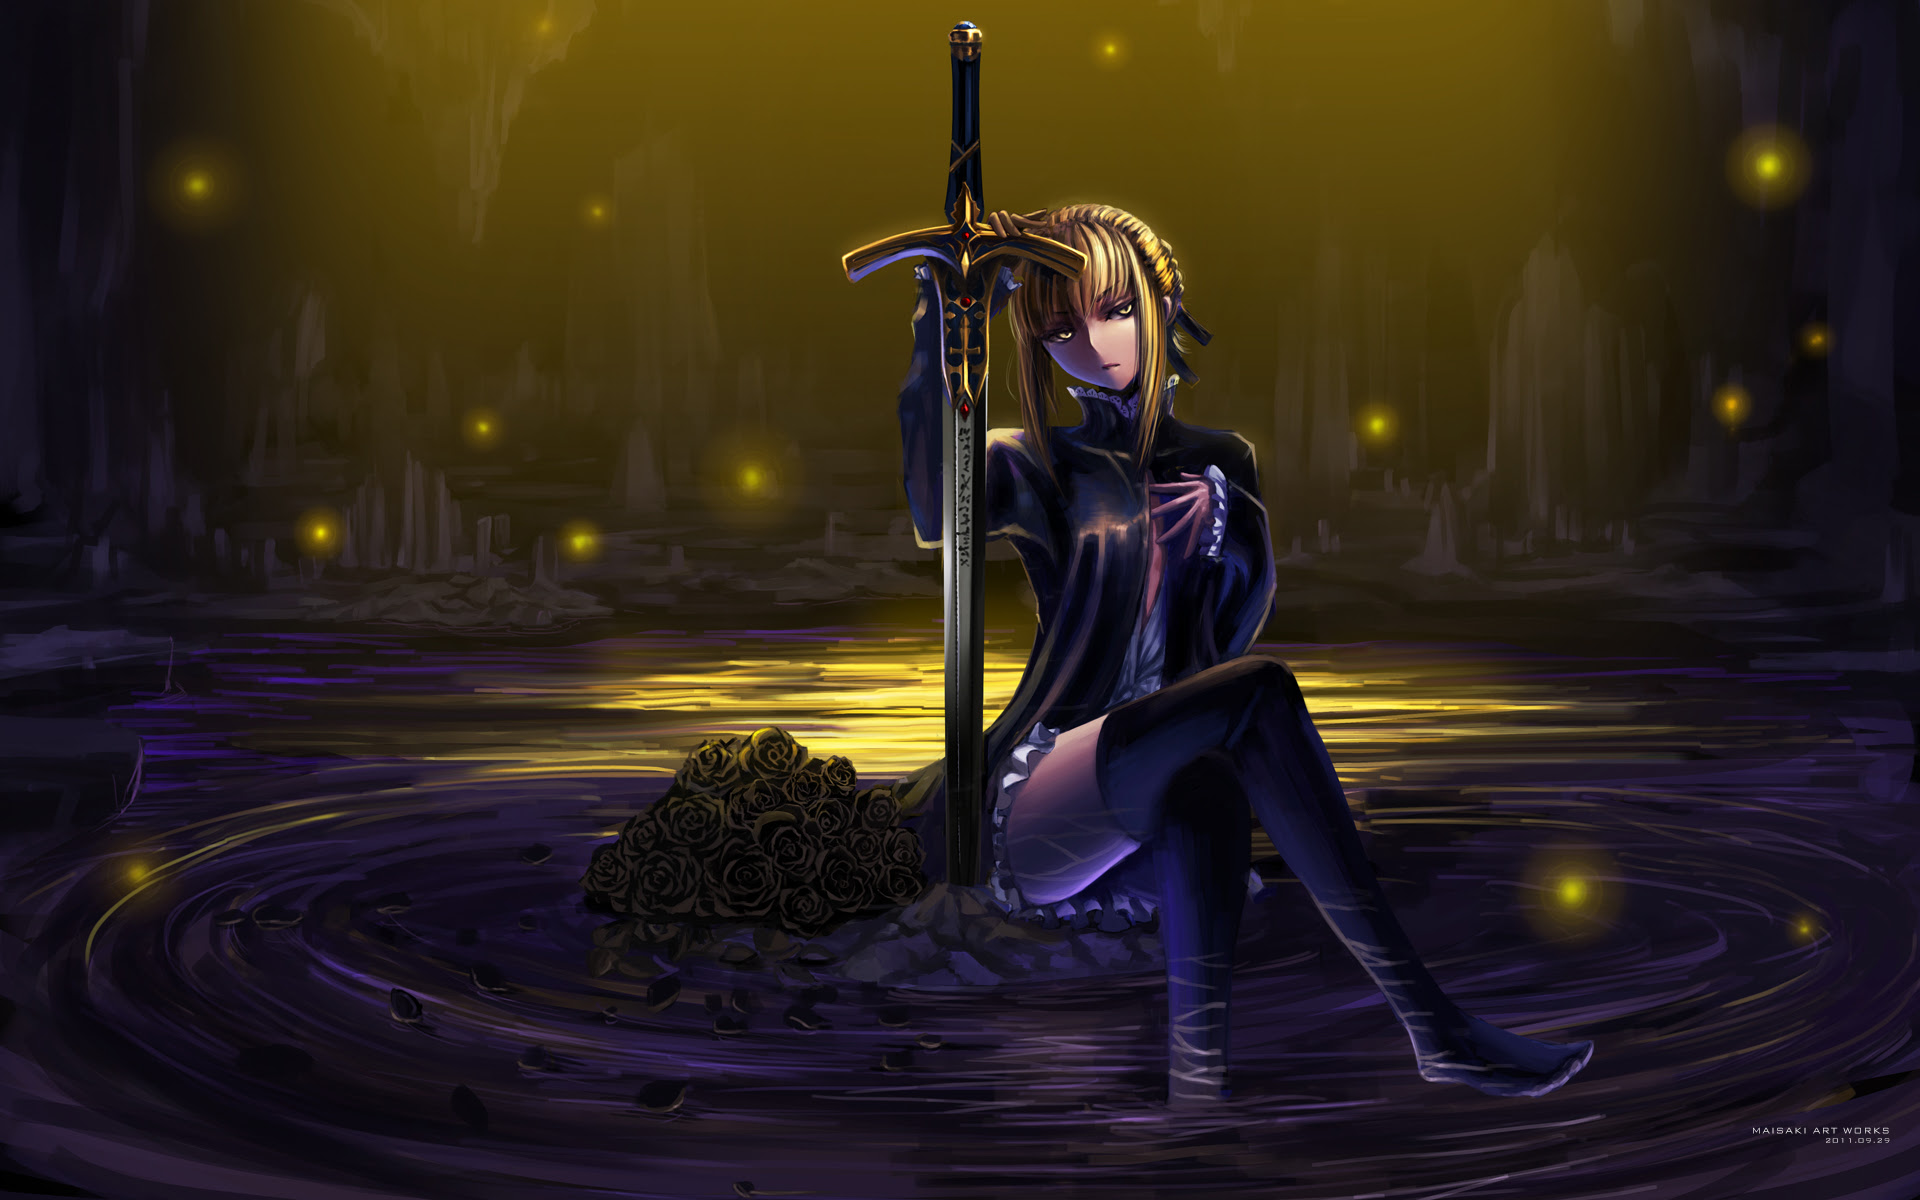 Fate Stay Night Haremaster99 壁紙 32290741 ファンポップ